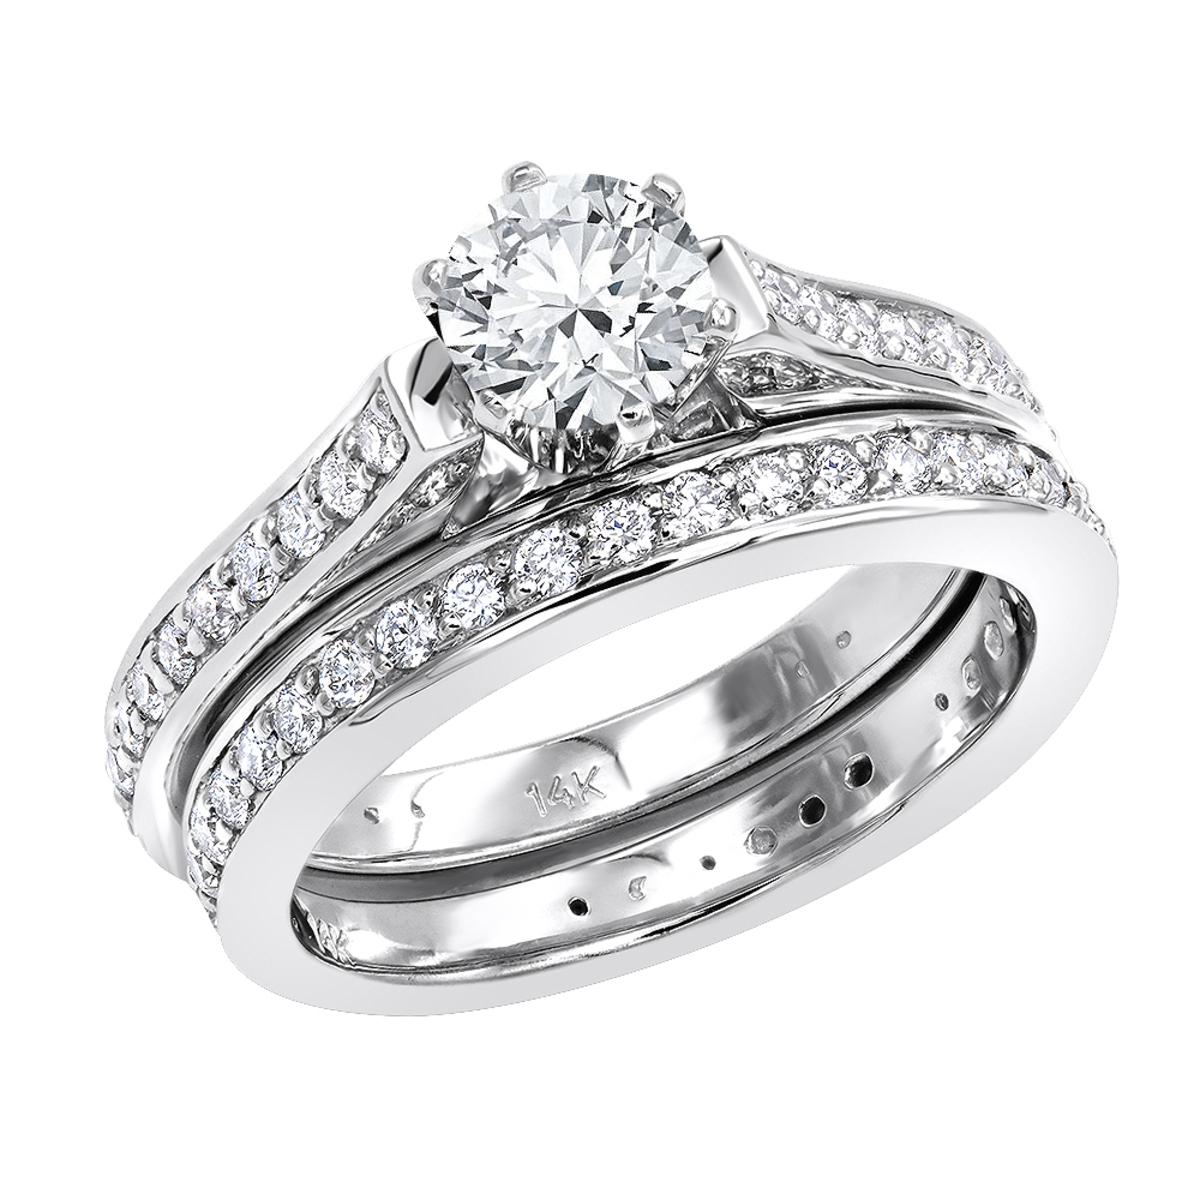 14K Gold Round Diamond Engagement Ring and Wedding Band Set 1.75ct